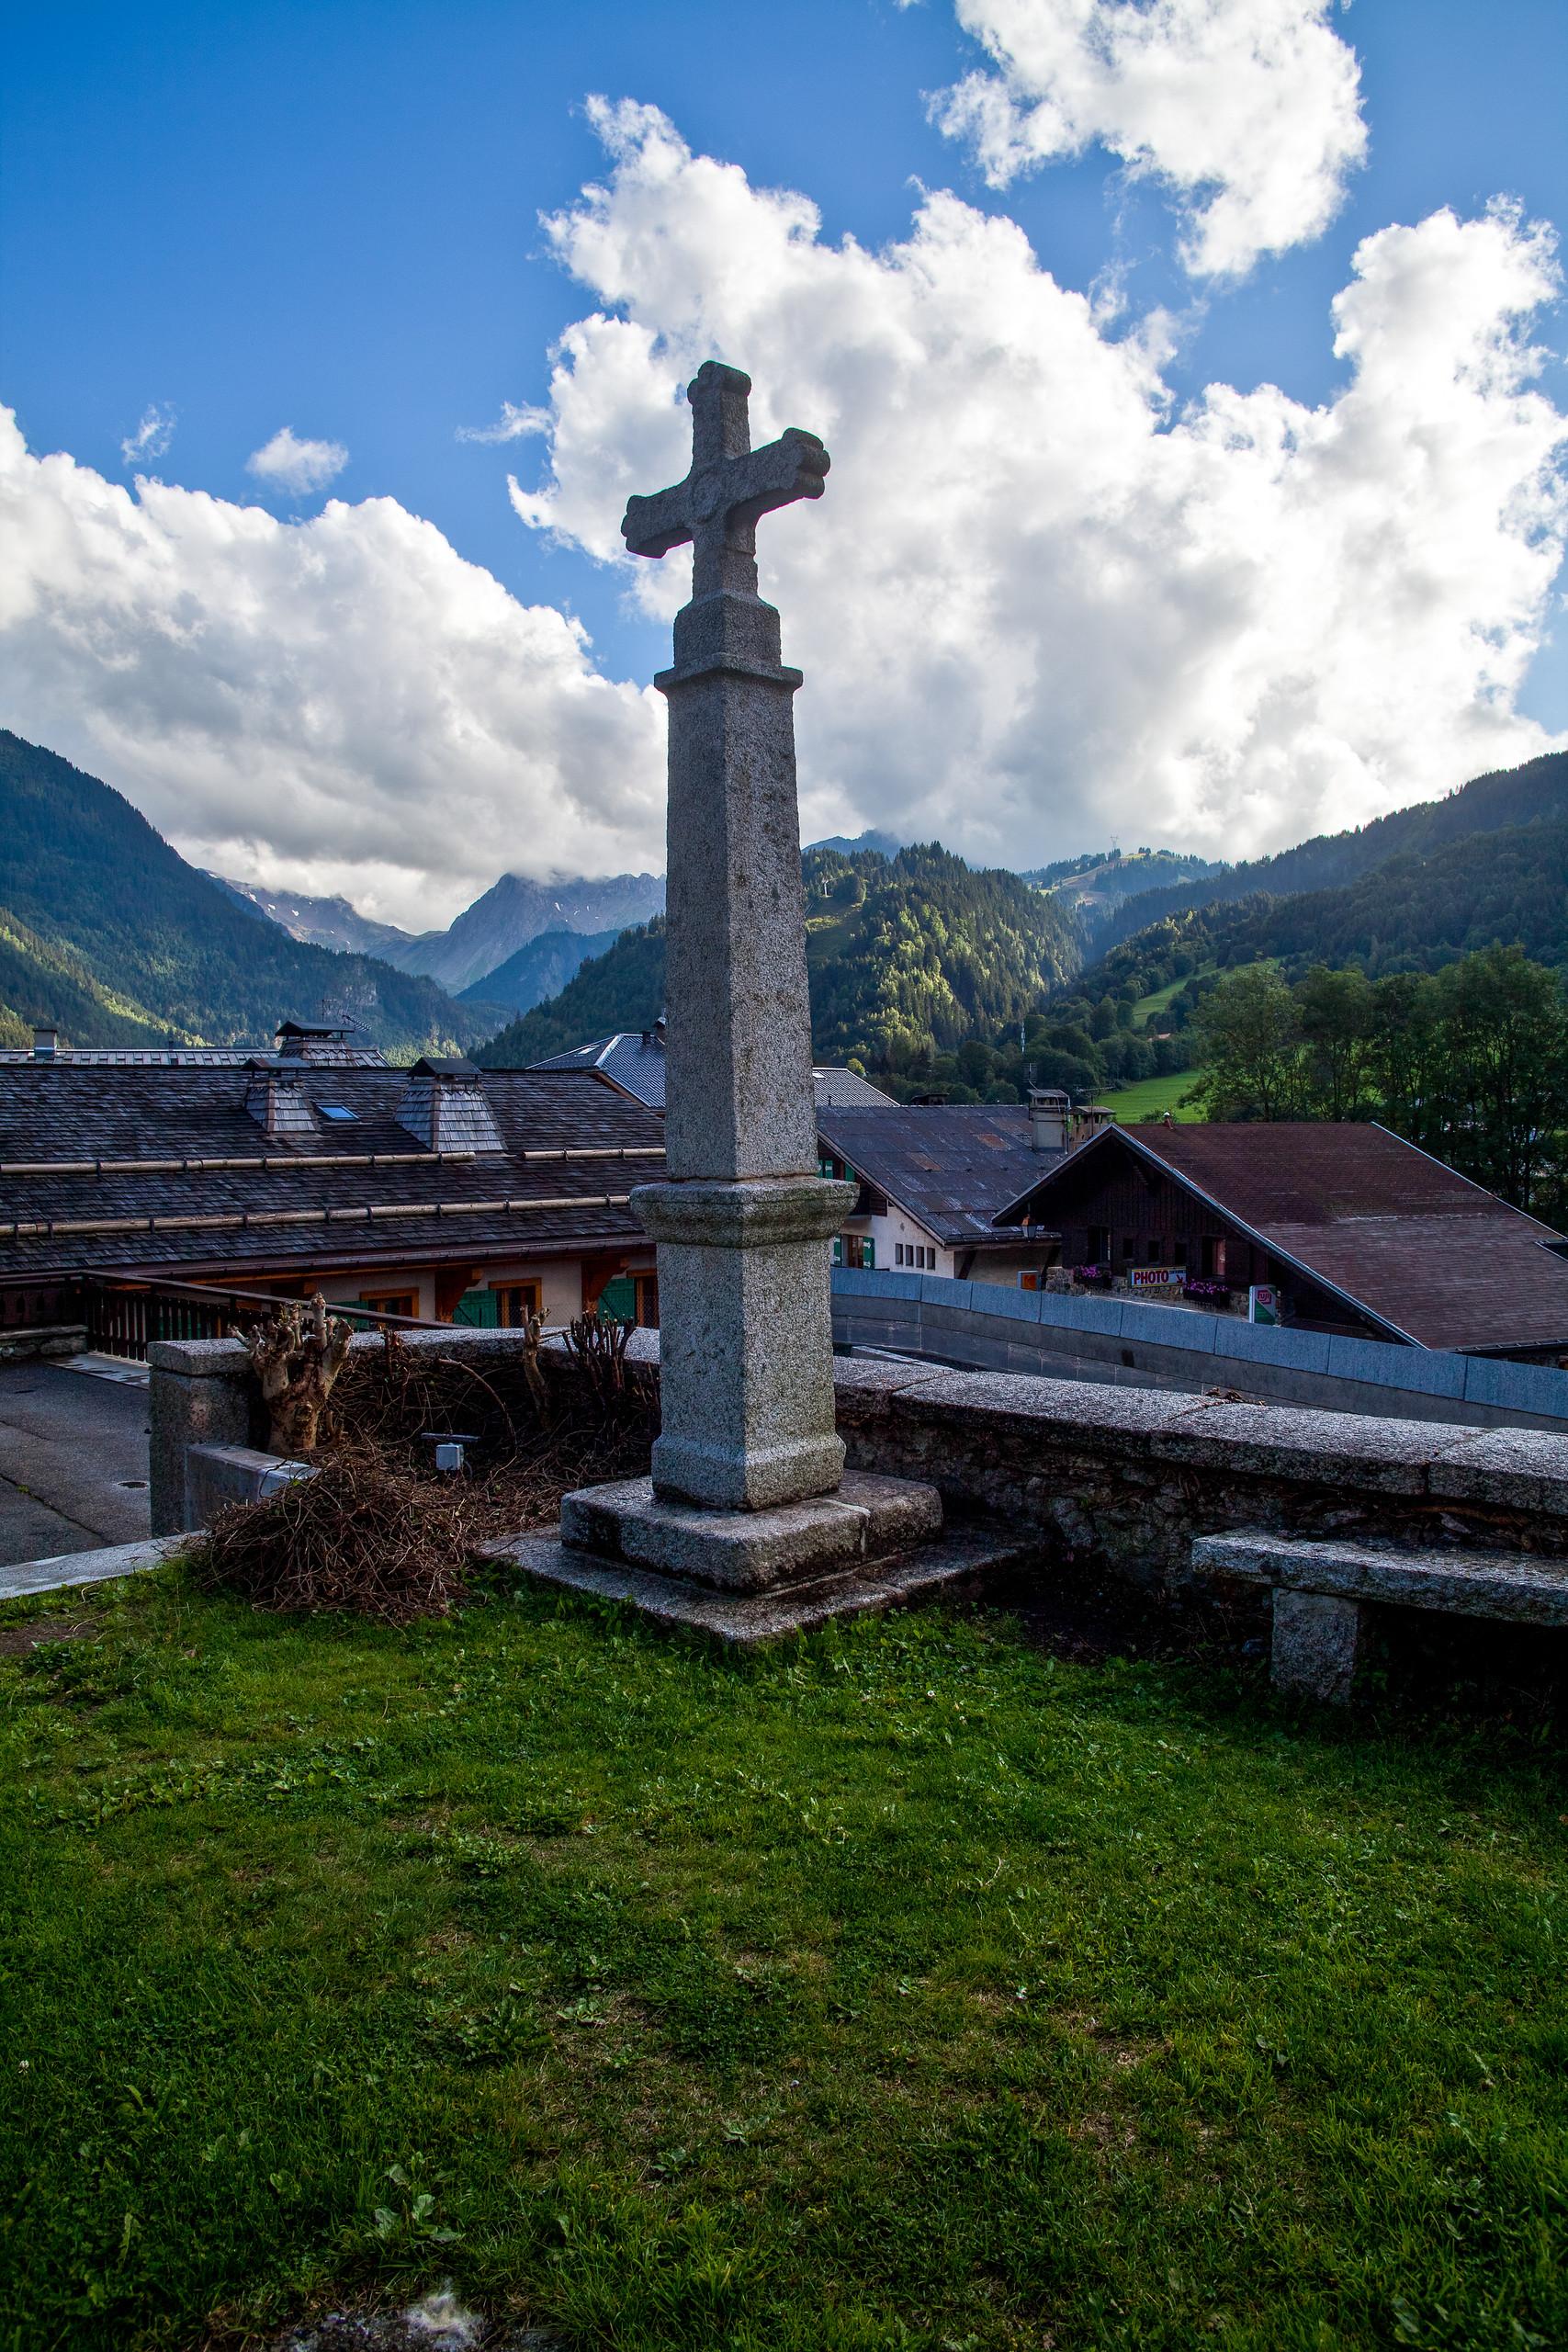 Church Cross at Les Contamines, France